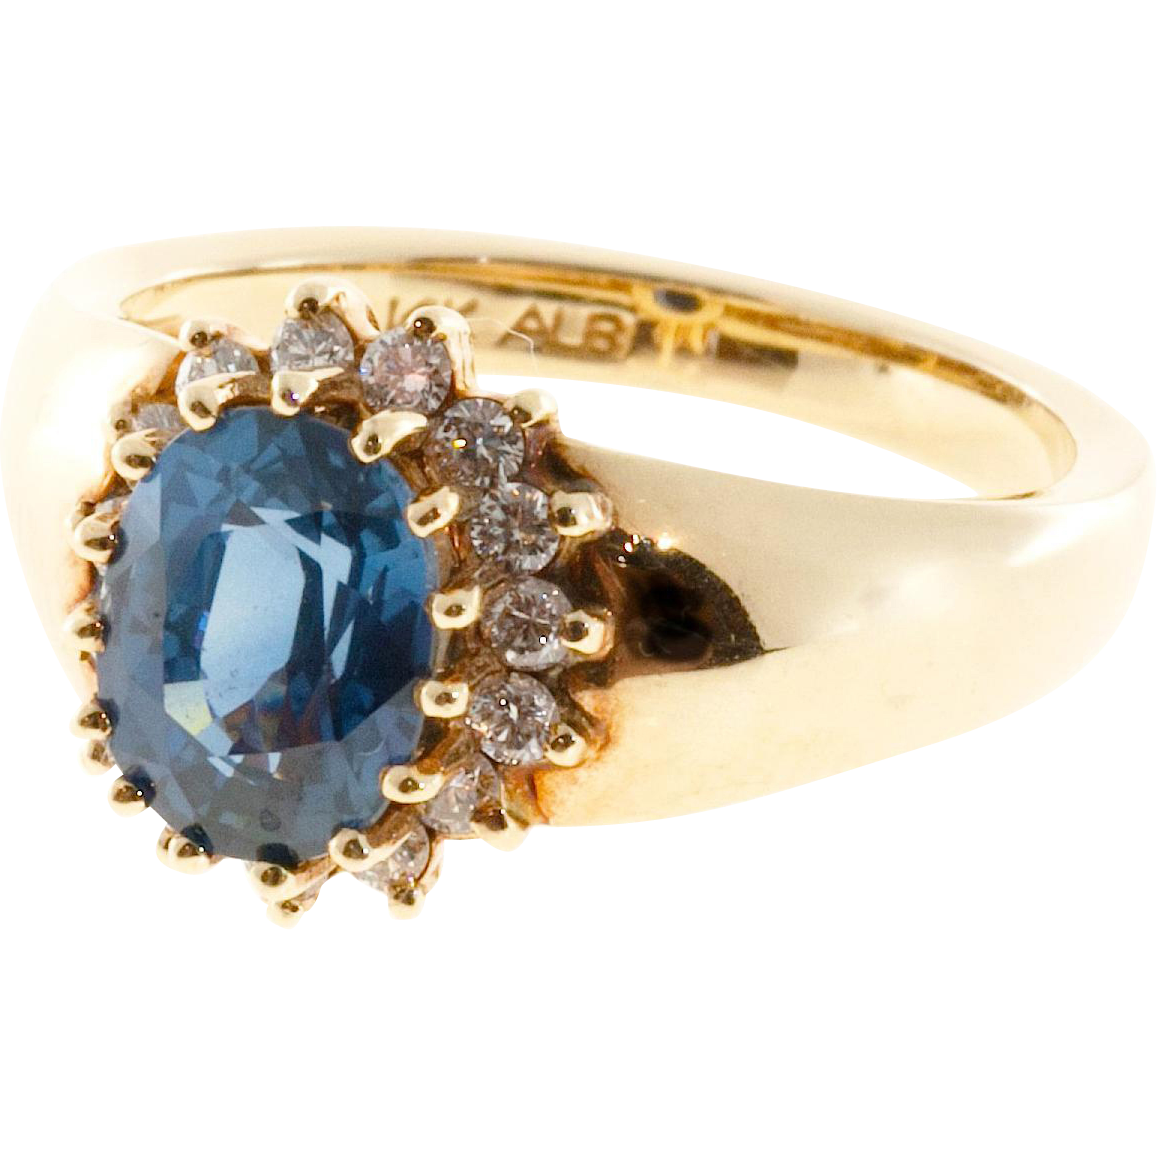 Oval Ceylon Sapphire Diamond Engagement Ring